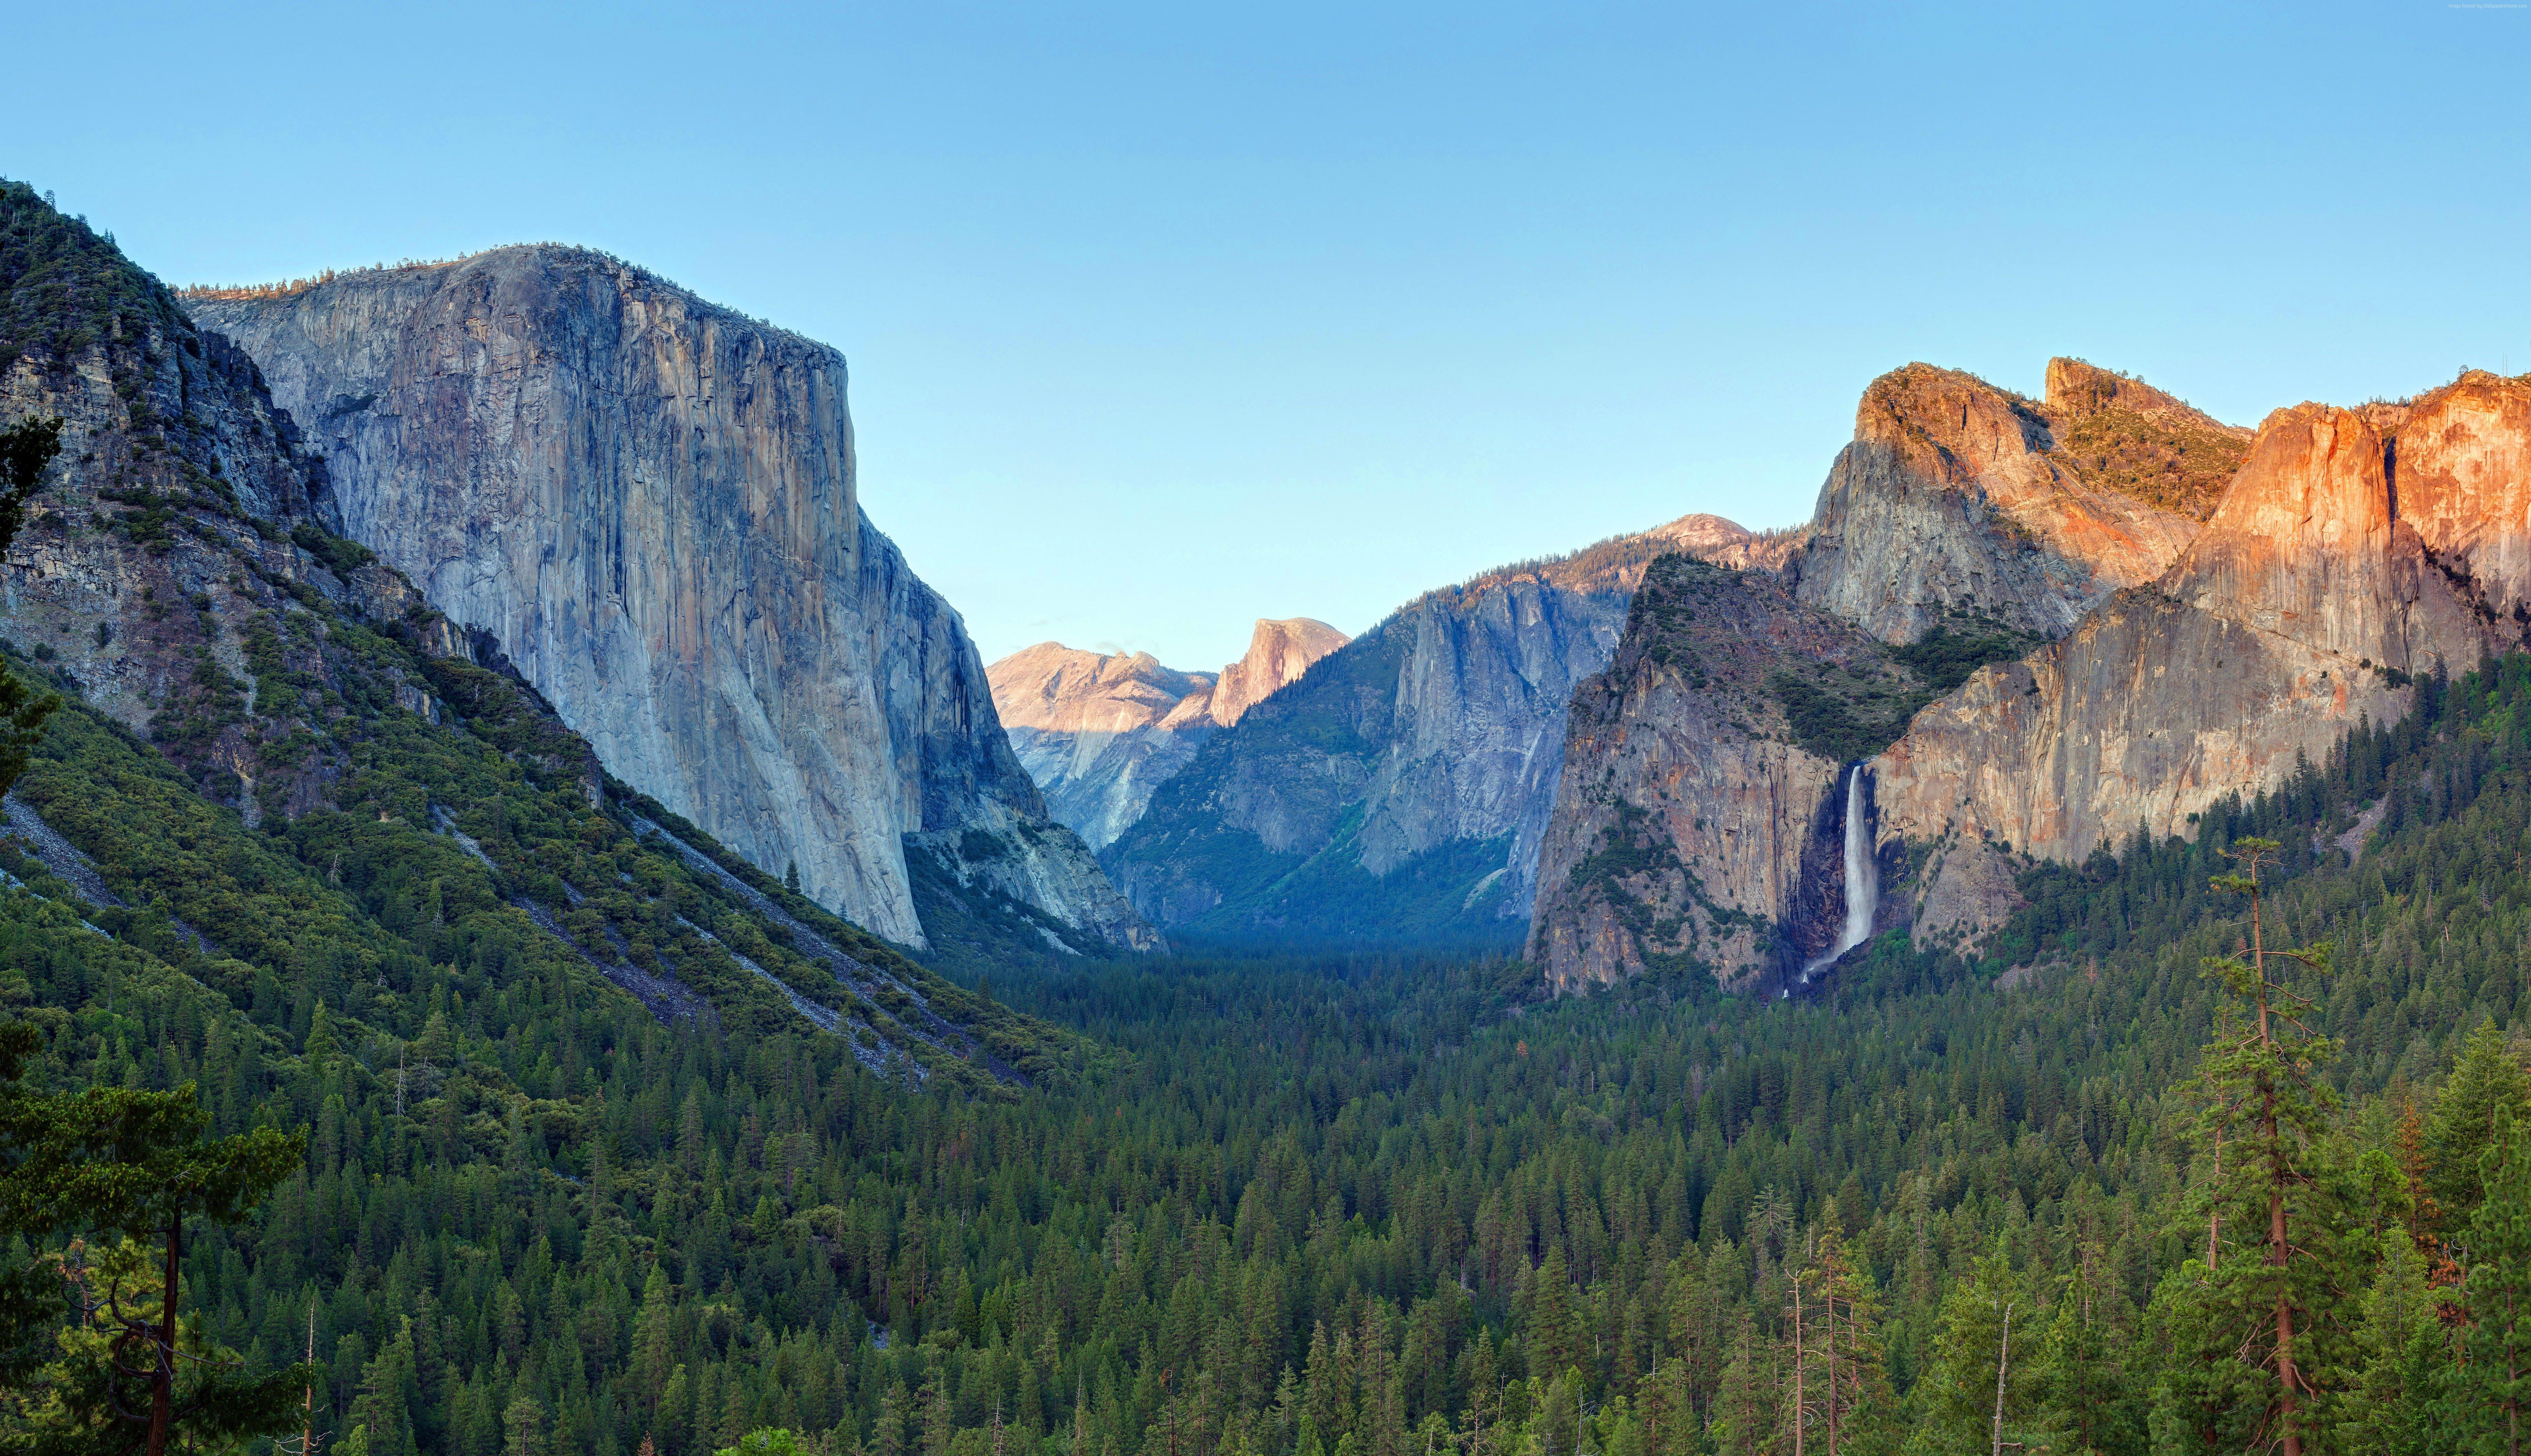 Apple 5k Yosemite Forest Osx 4k Mountains 5k Wallpaper Hdwallpaper Desktop Yosemite Mountain Wallpaper Mountains